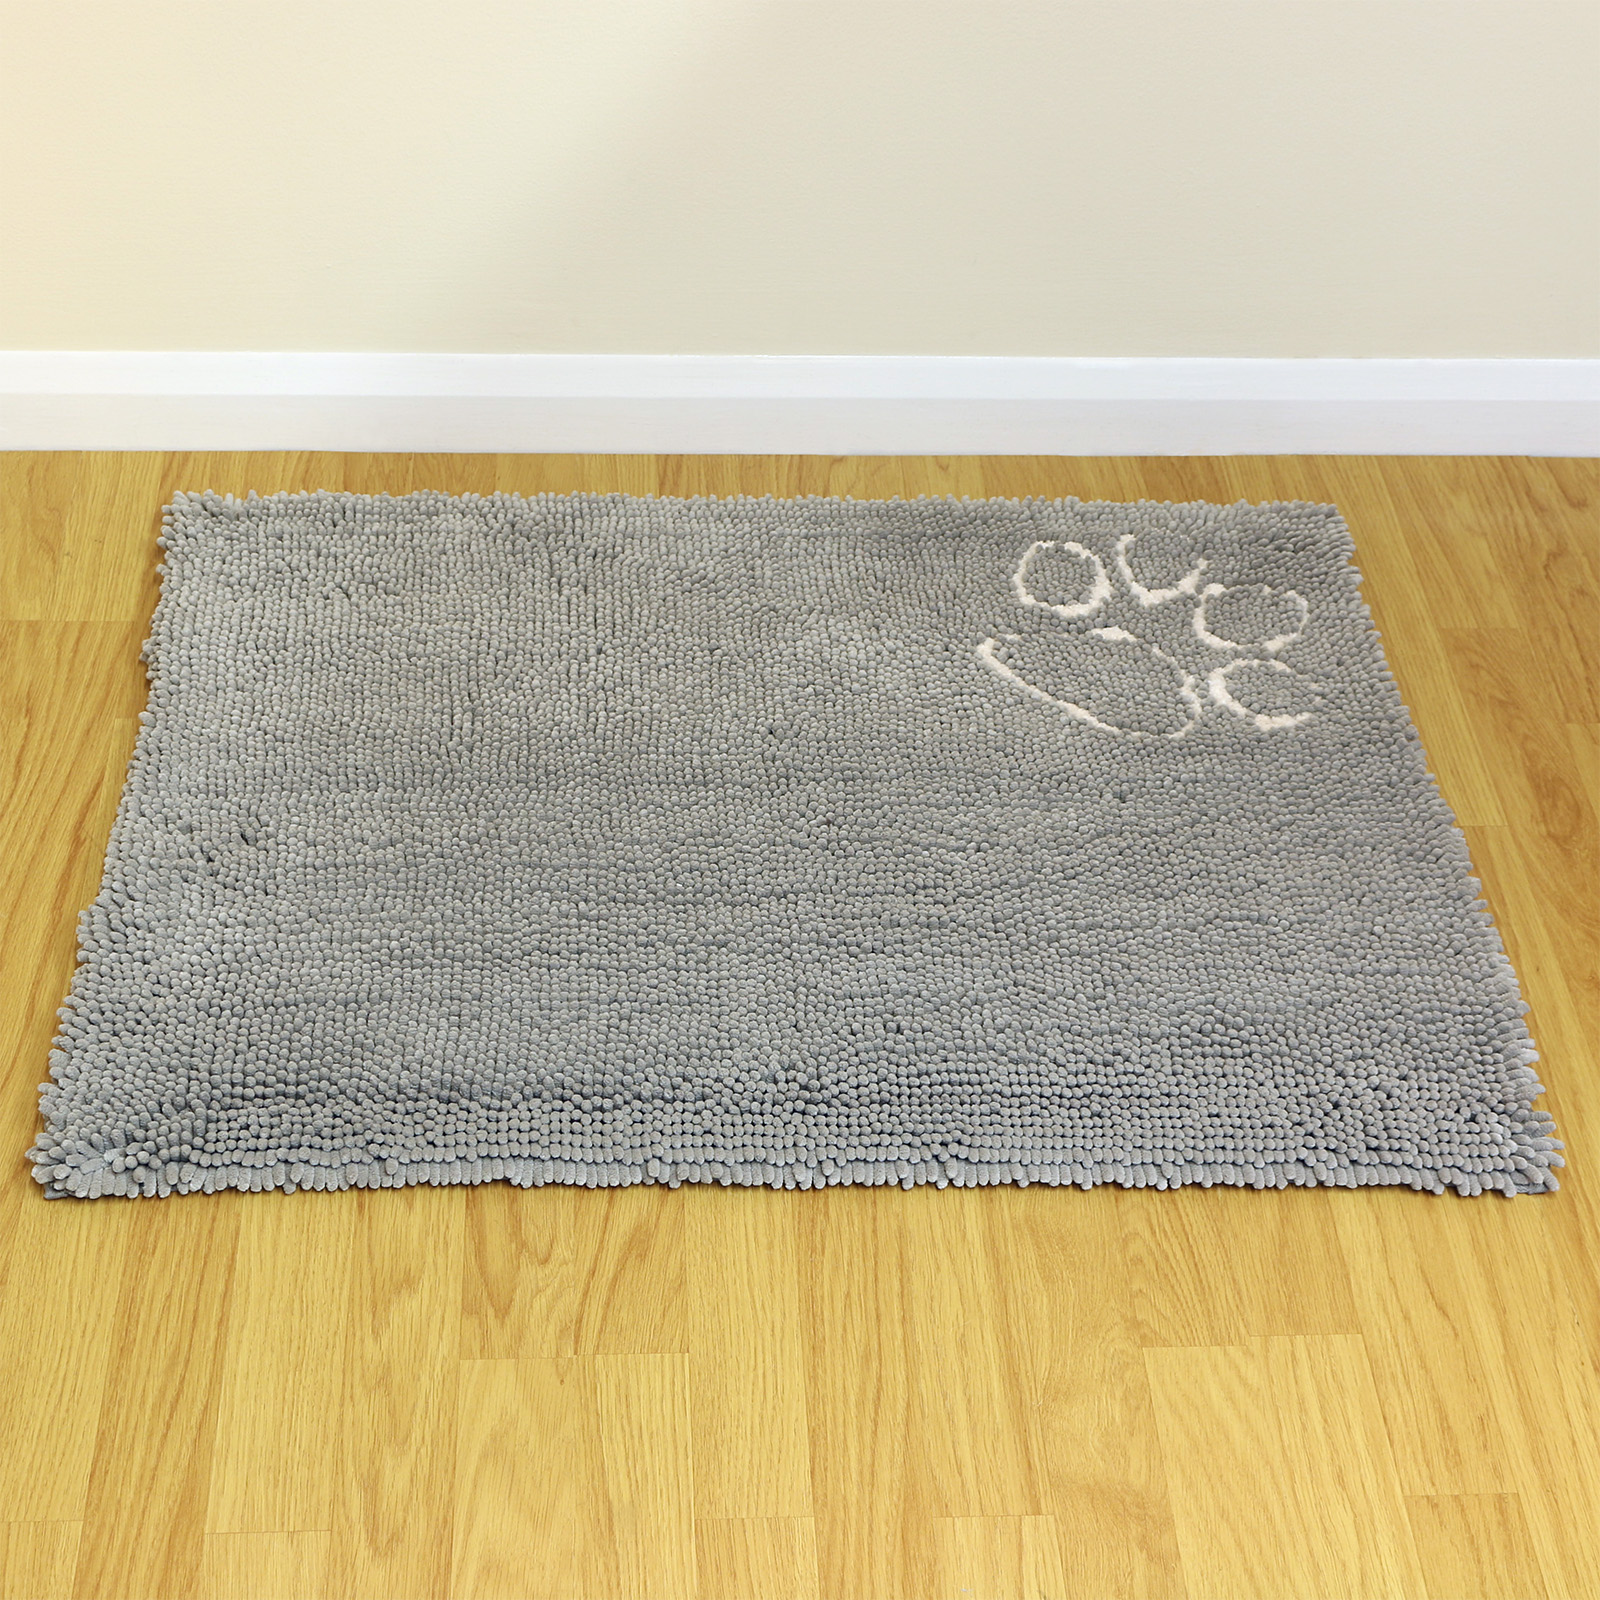 att good mats floors doormat x for absorbent floor mat dog dirty dogs photo of